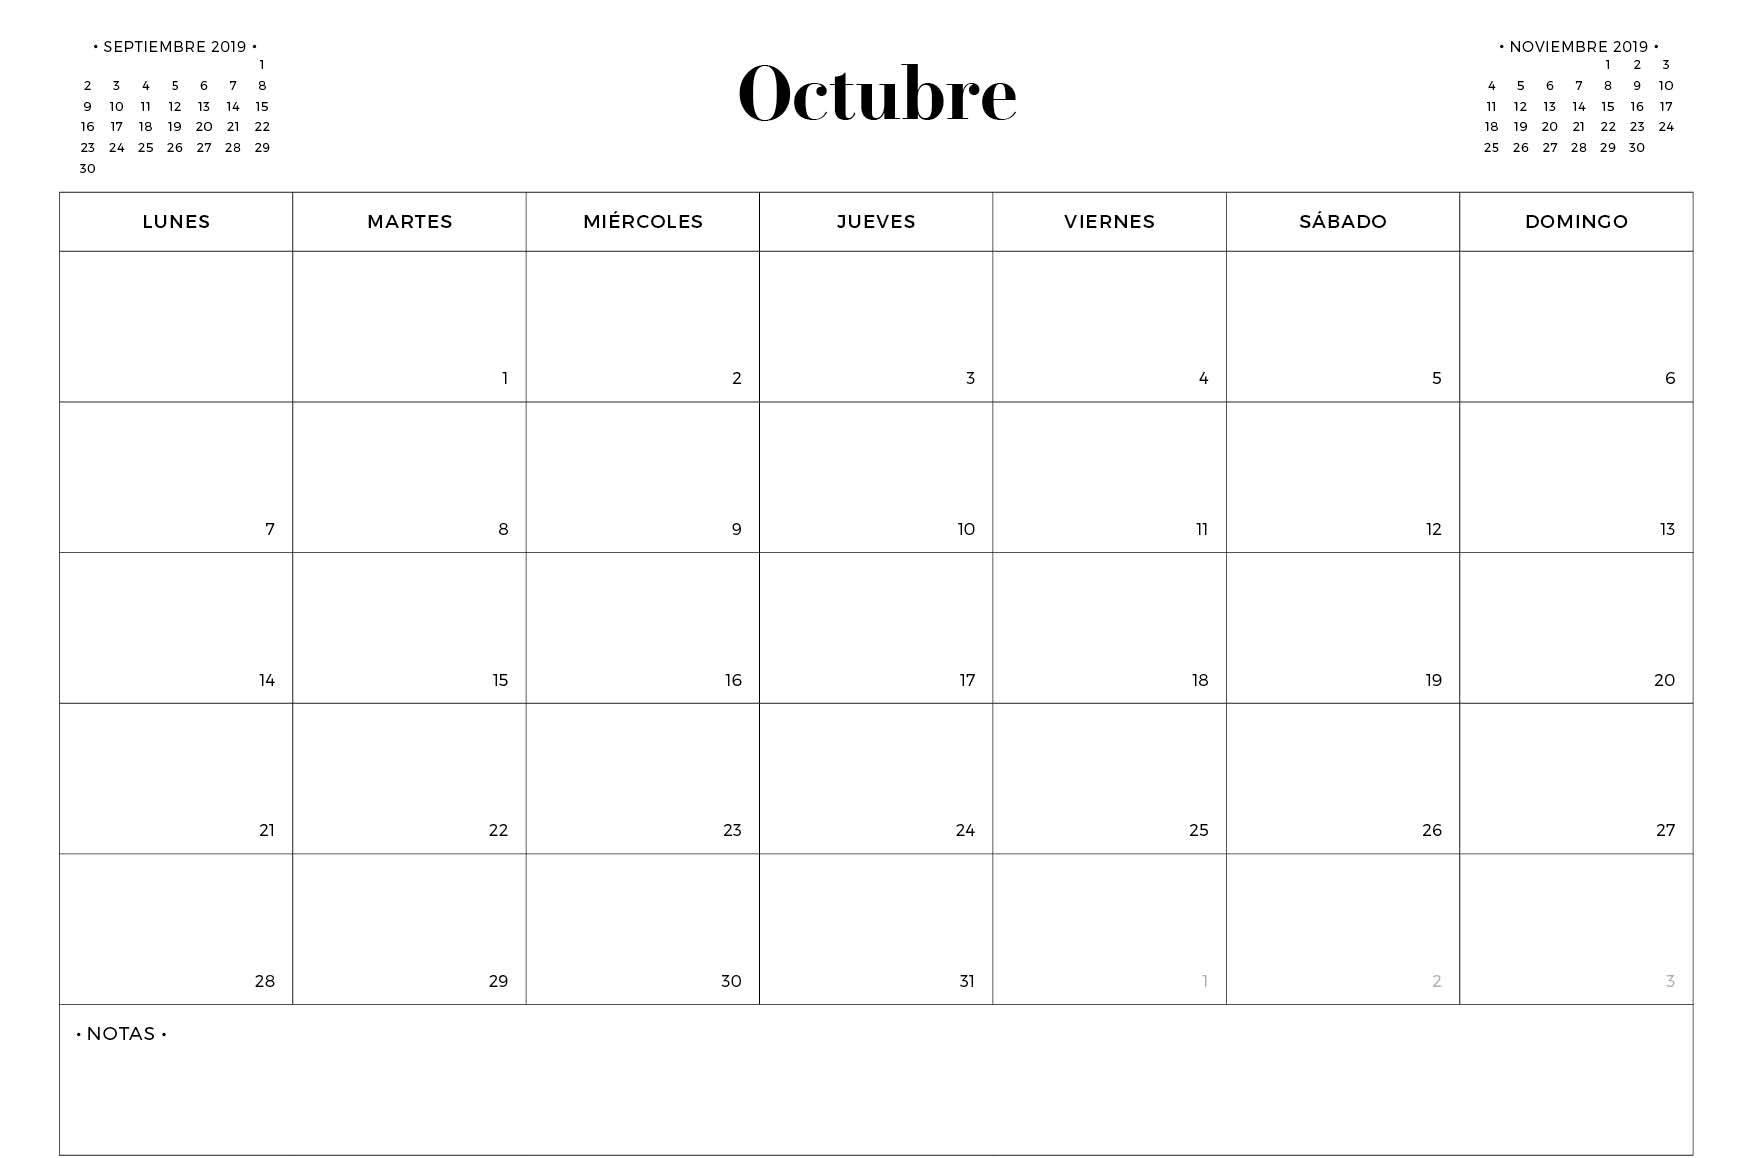 Plantilla de calendario de octubre de 2019